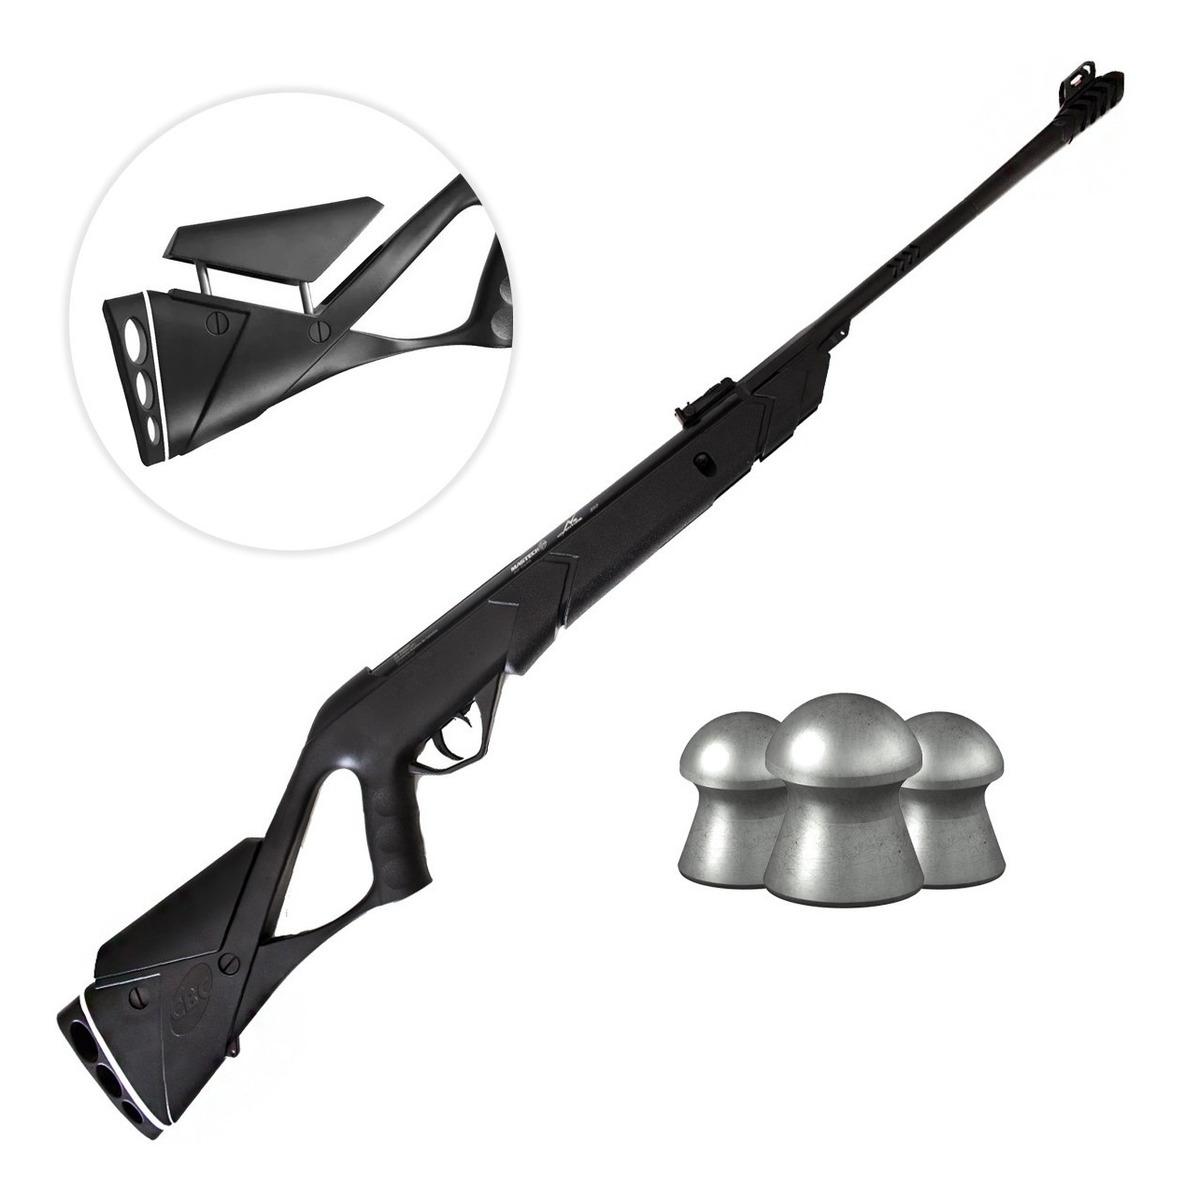 Rifle Nitro Magtech N2 Adventure 800 Fps 5 5 Aire Comprimido